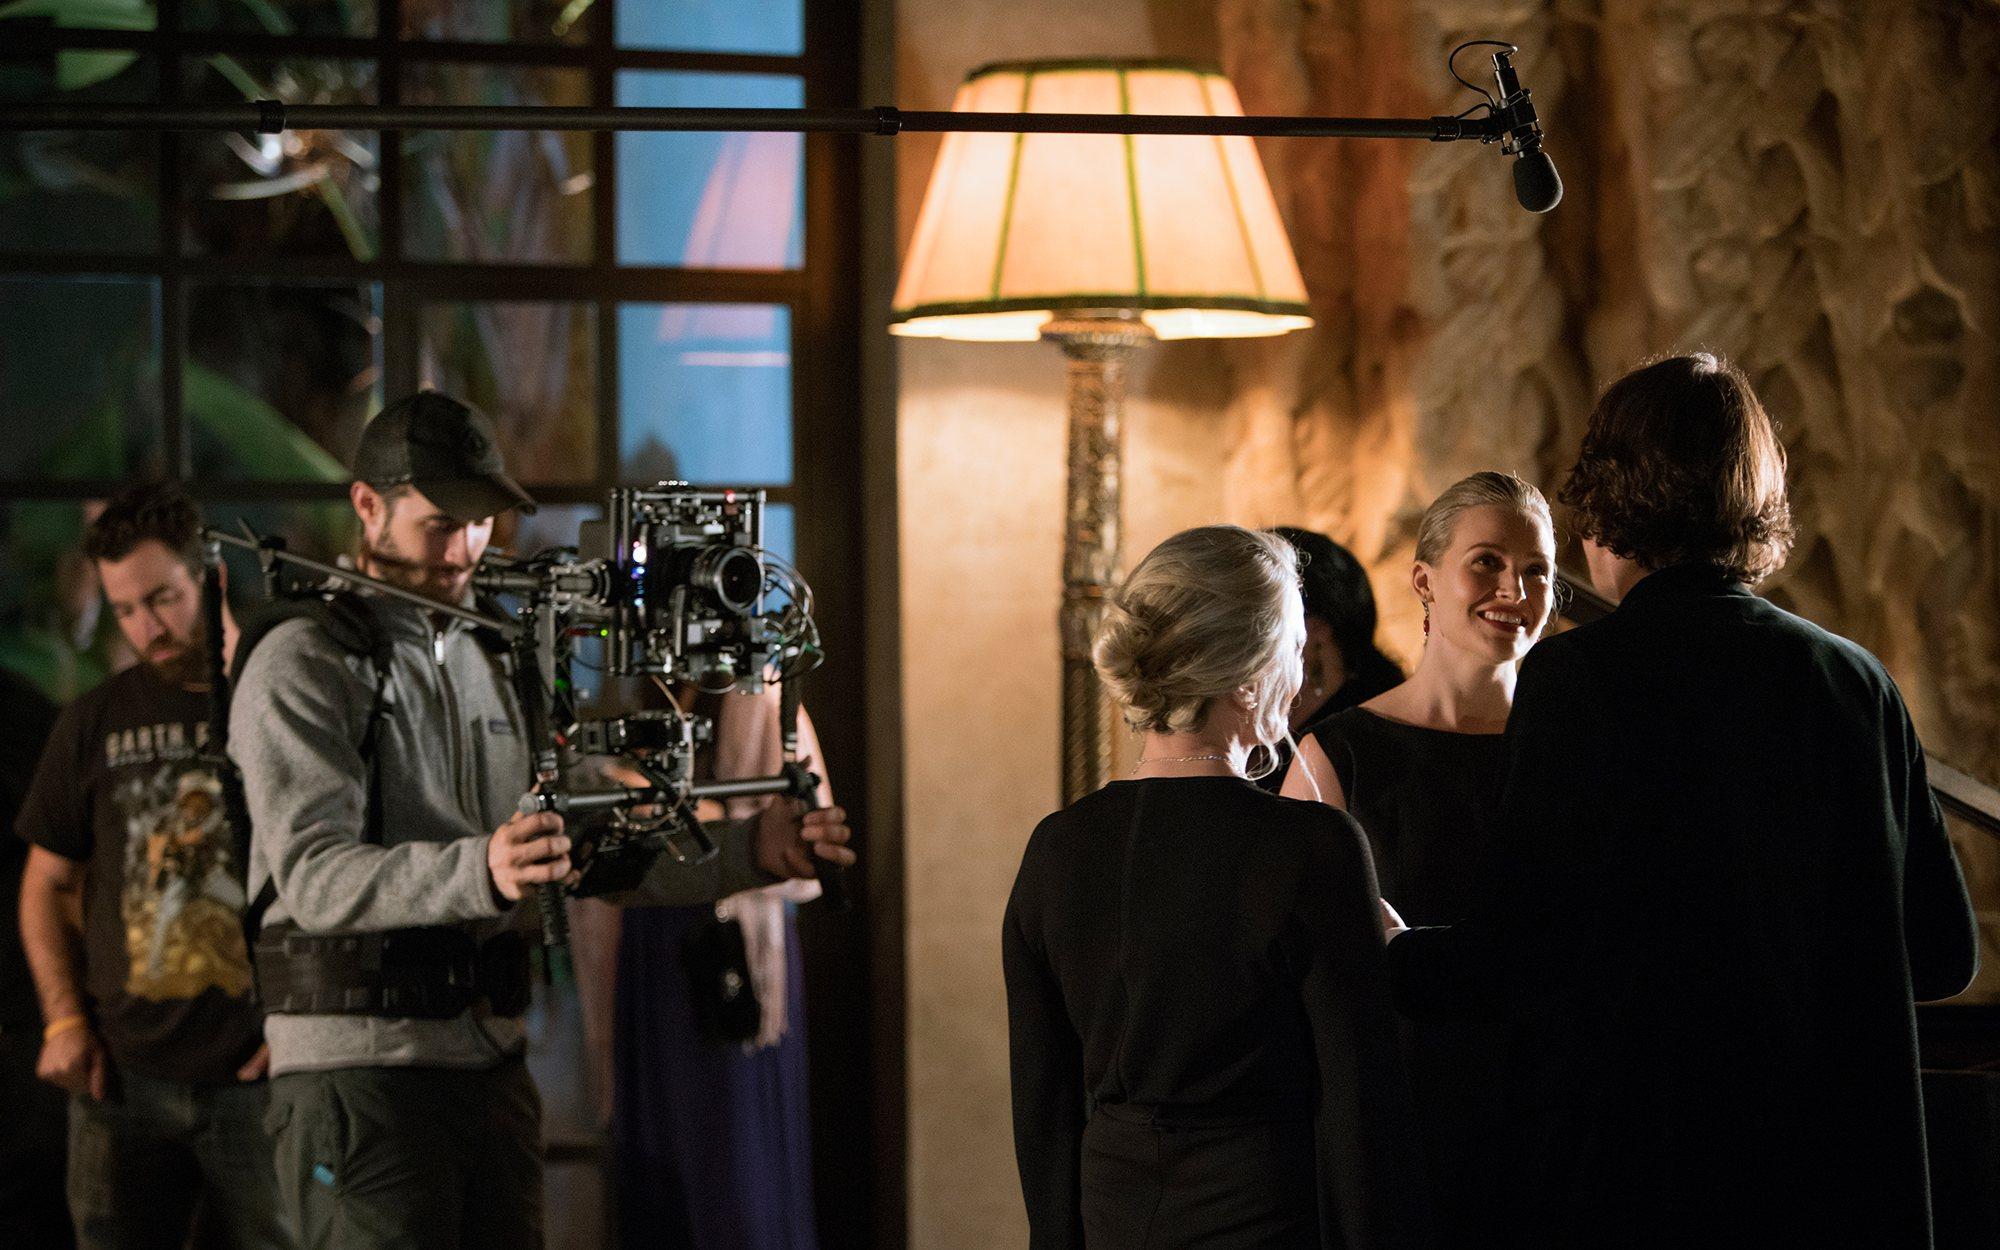 Actors preparing for a scene